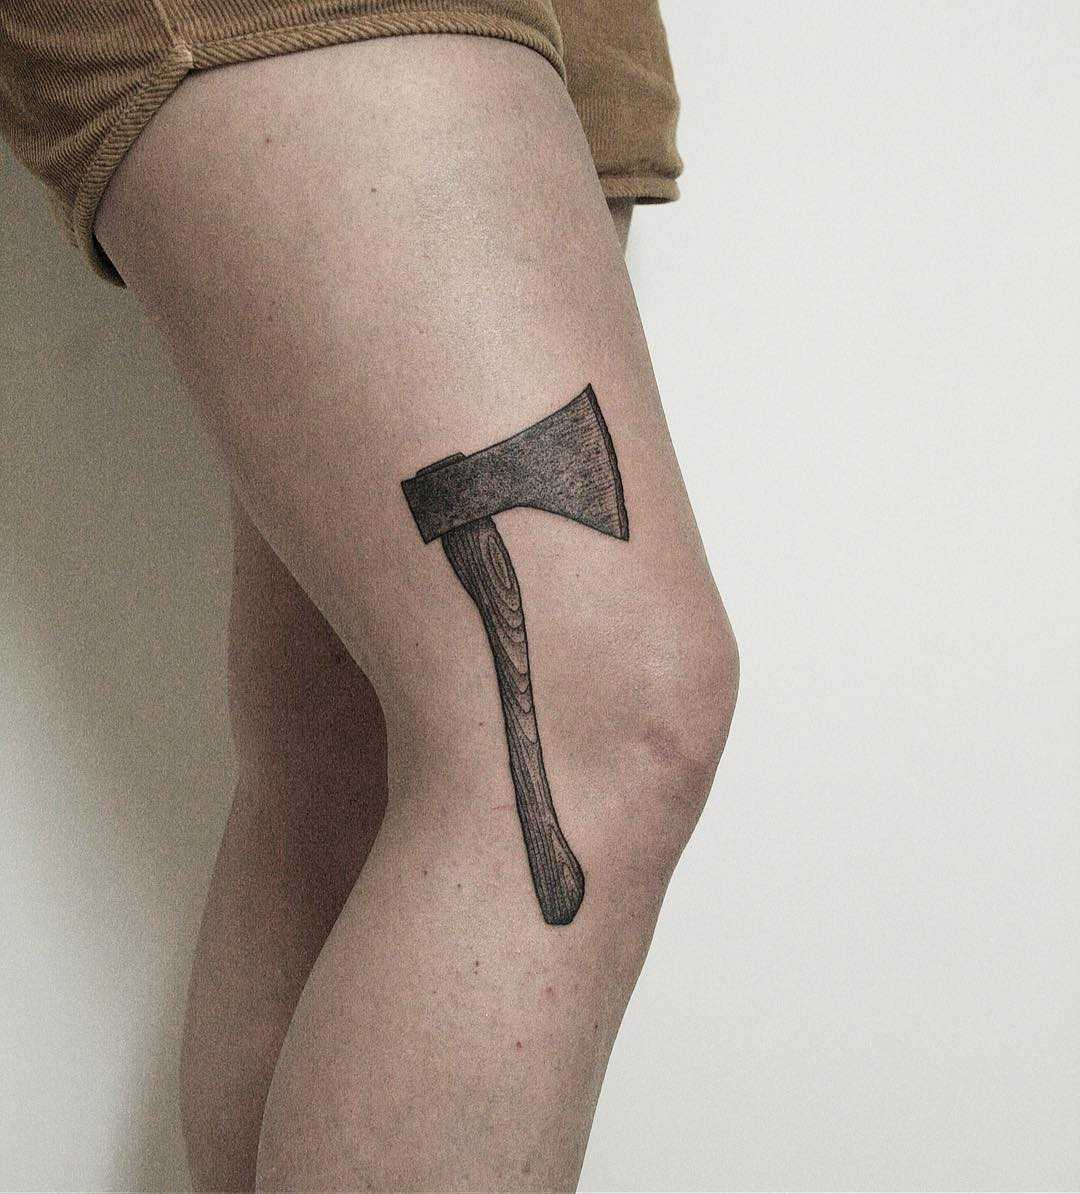 Tough axe by tattooist Spence @zz tattoo